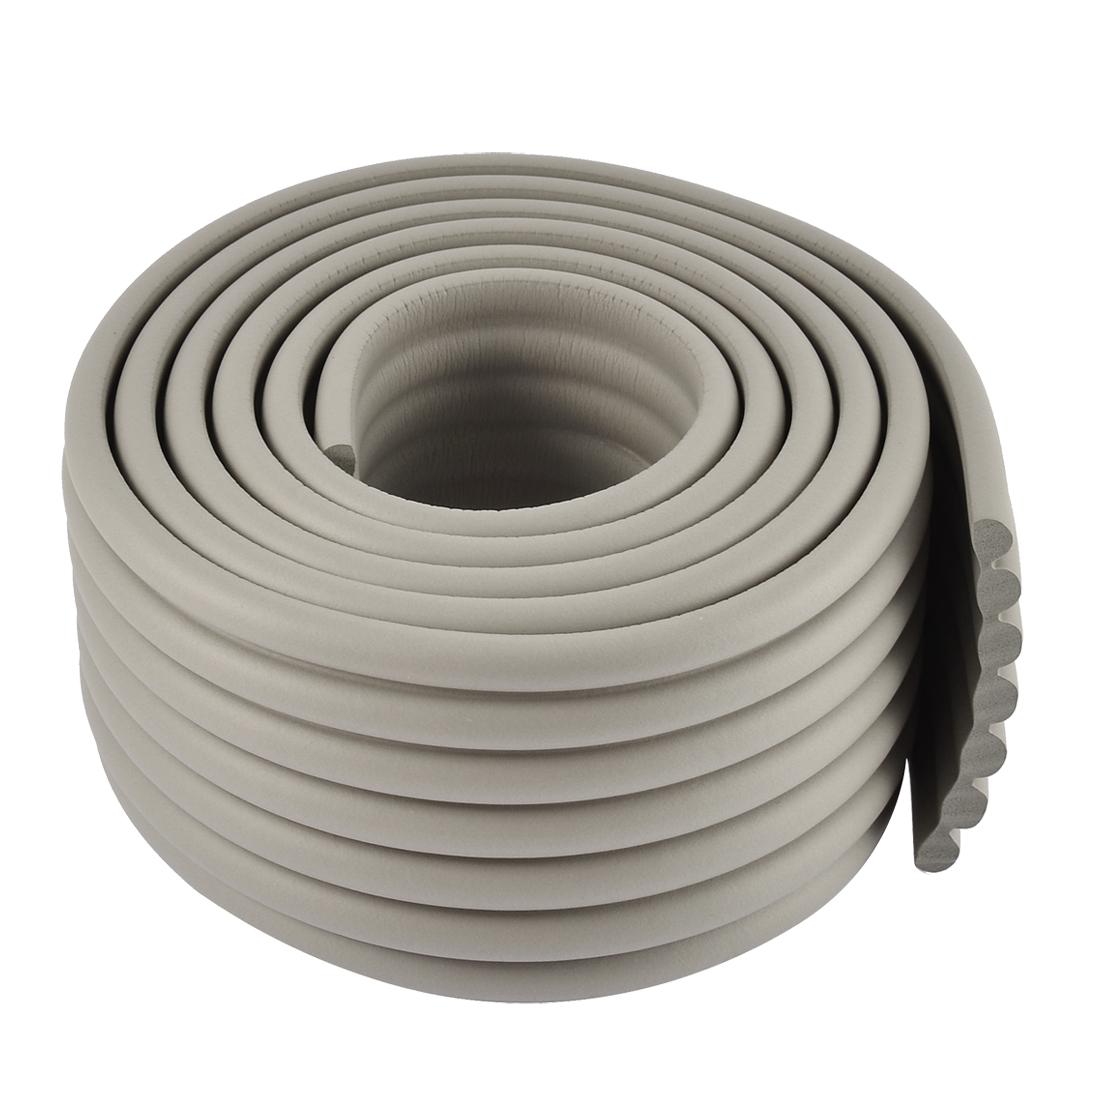 Furniture Corner Edge Safety Protection Cushion Guard 2M Long Gray